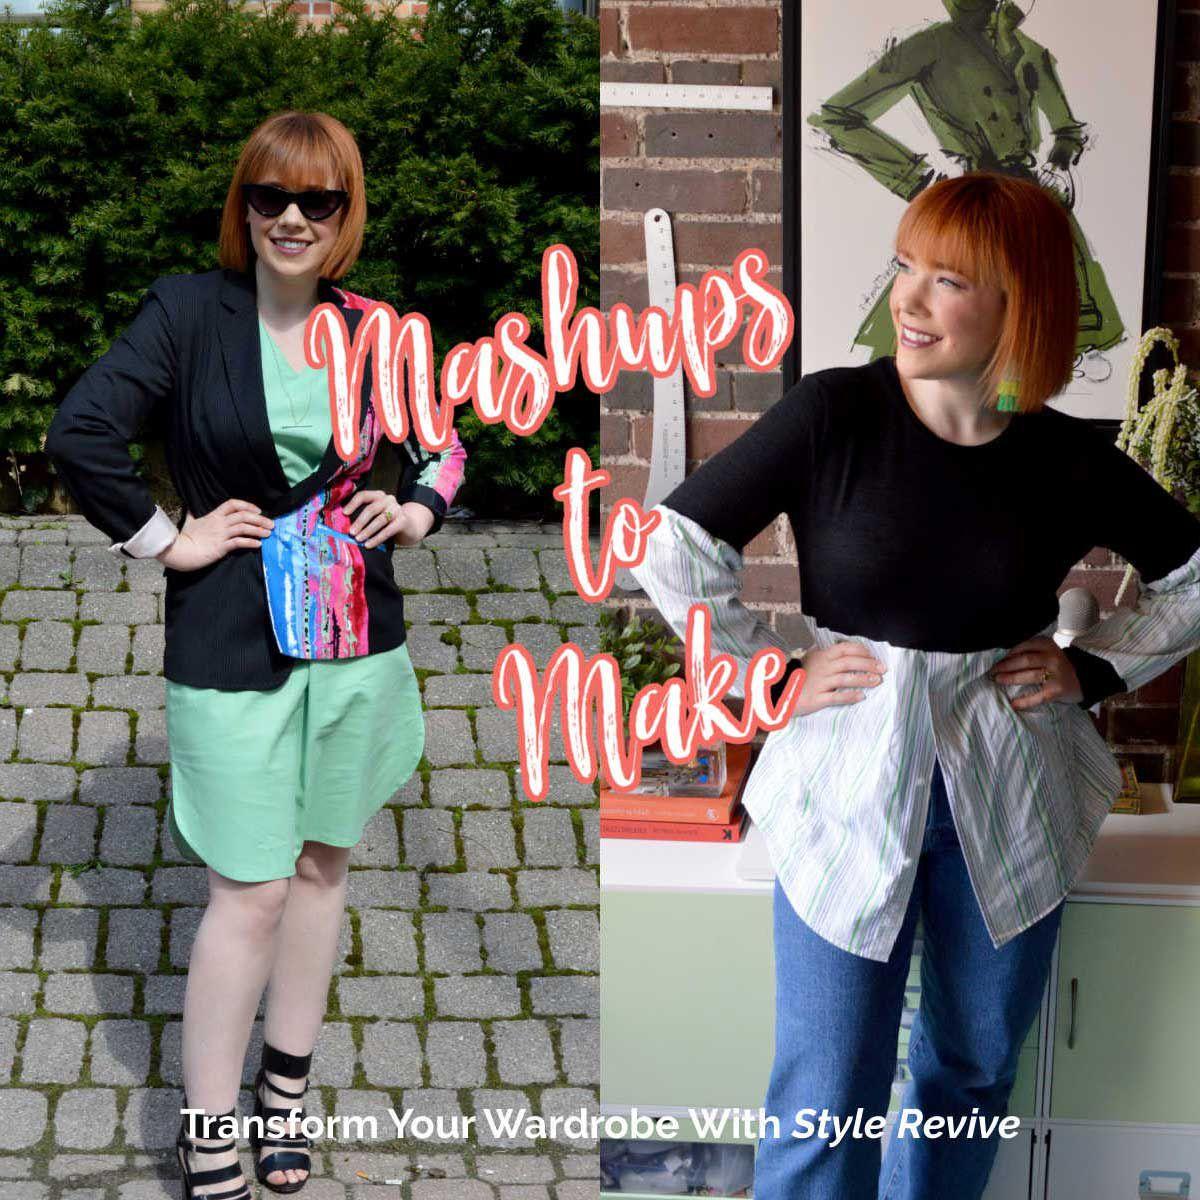 Style Revive Season 1 - Episode 3 Mashups to Sew